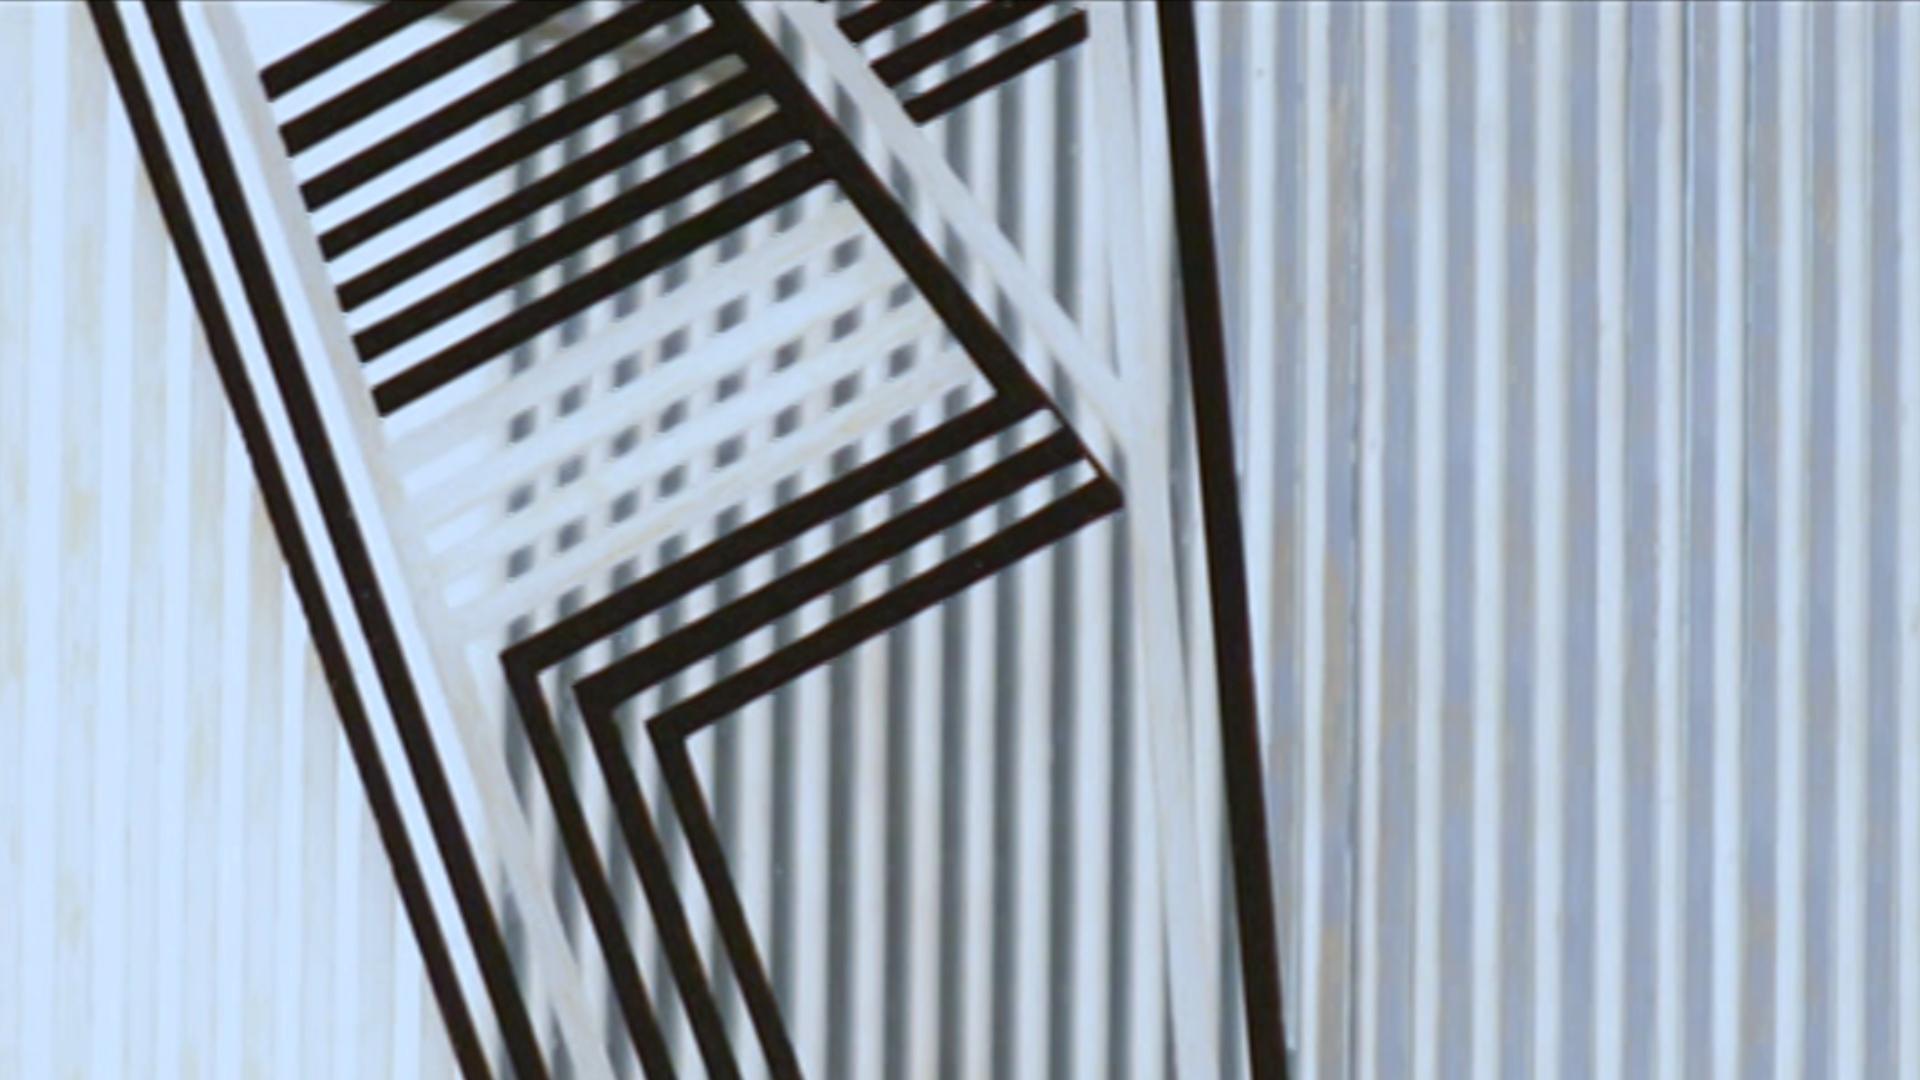 La Sala. Guggenheim - Soto. La cuarta dimensión